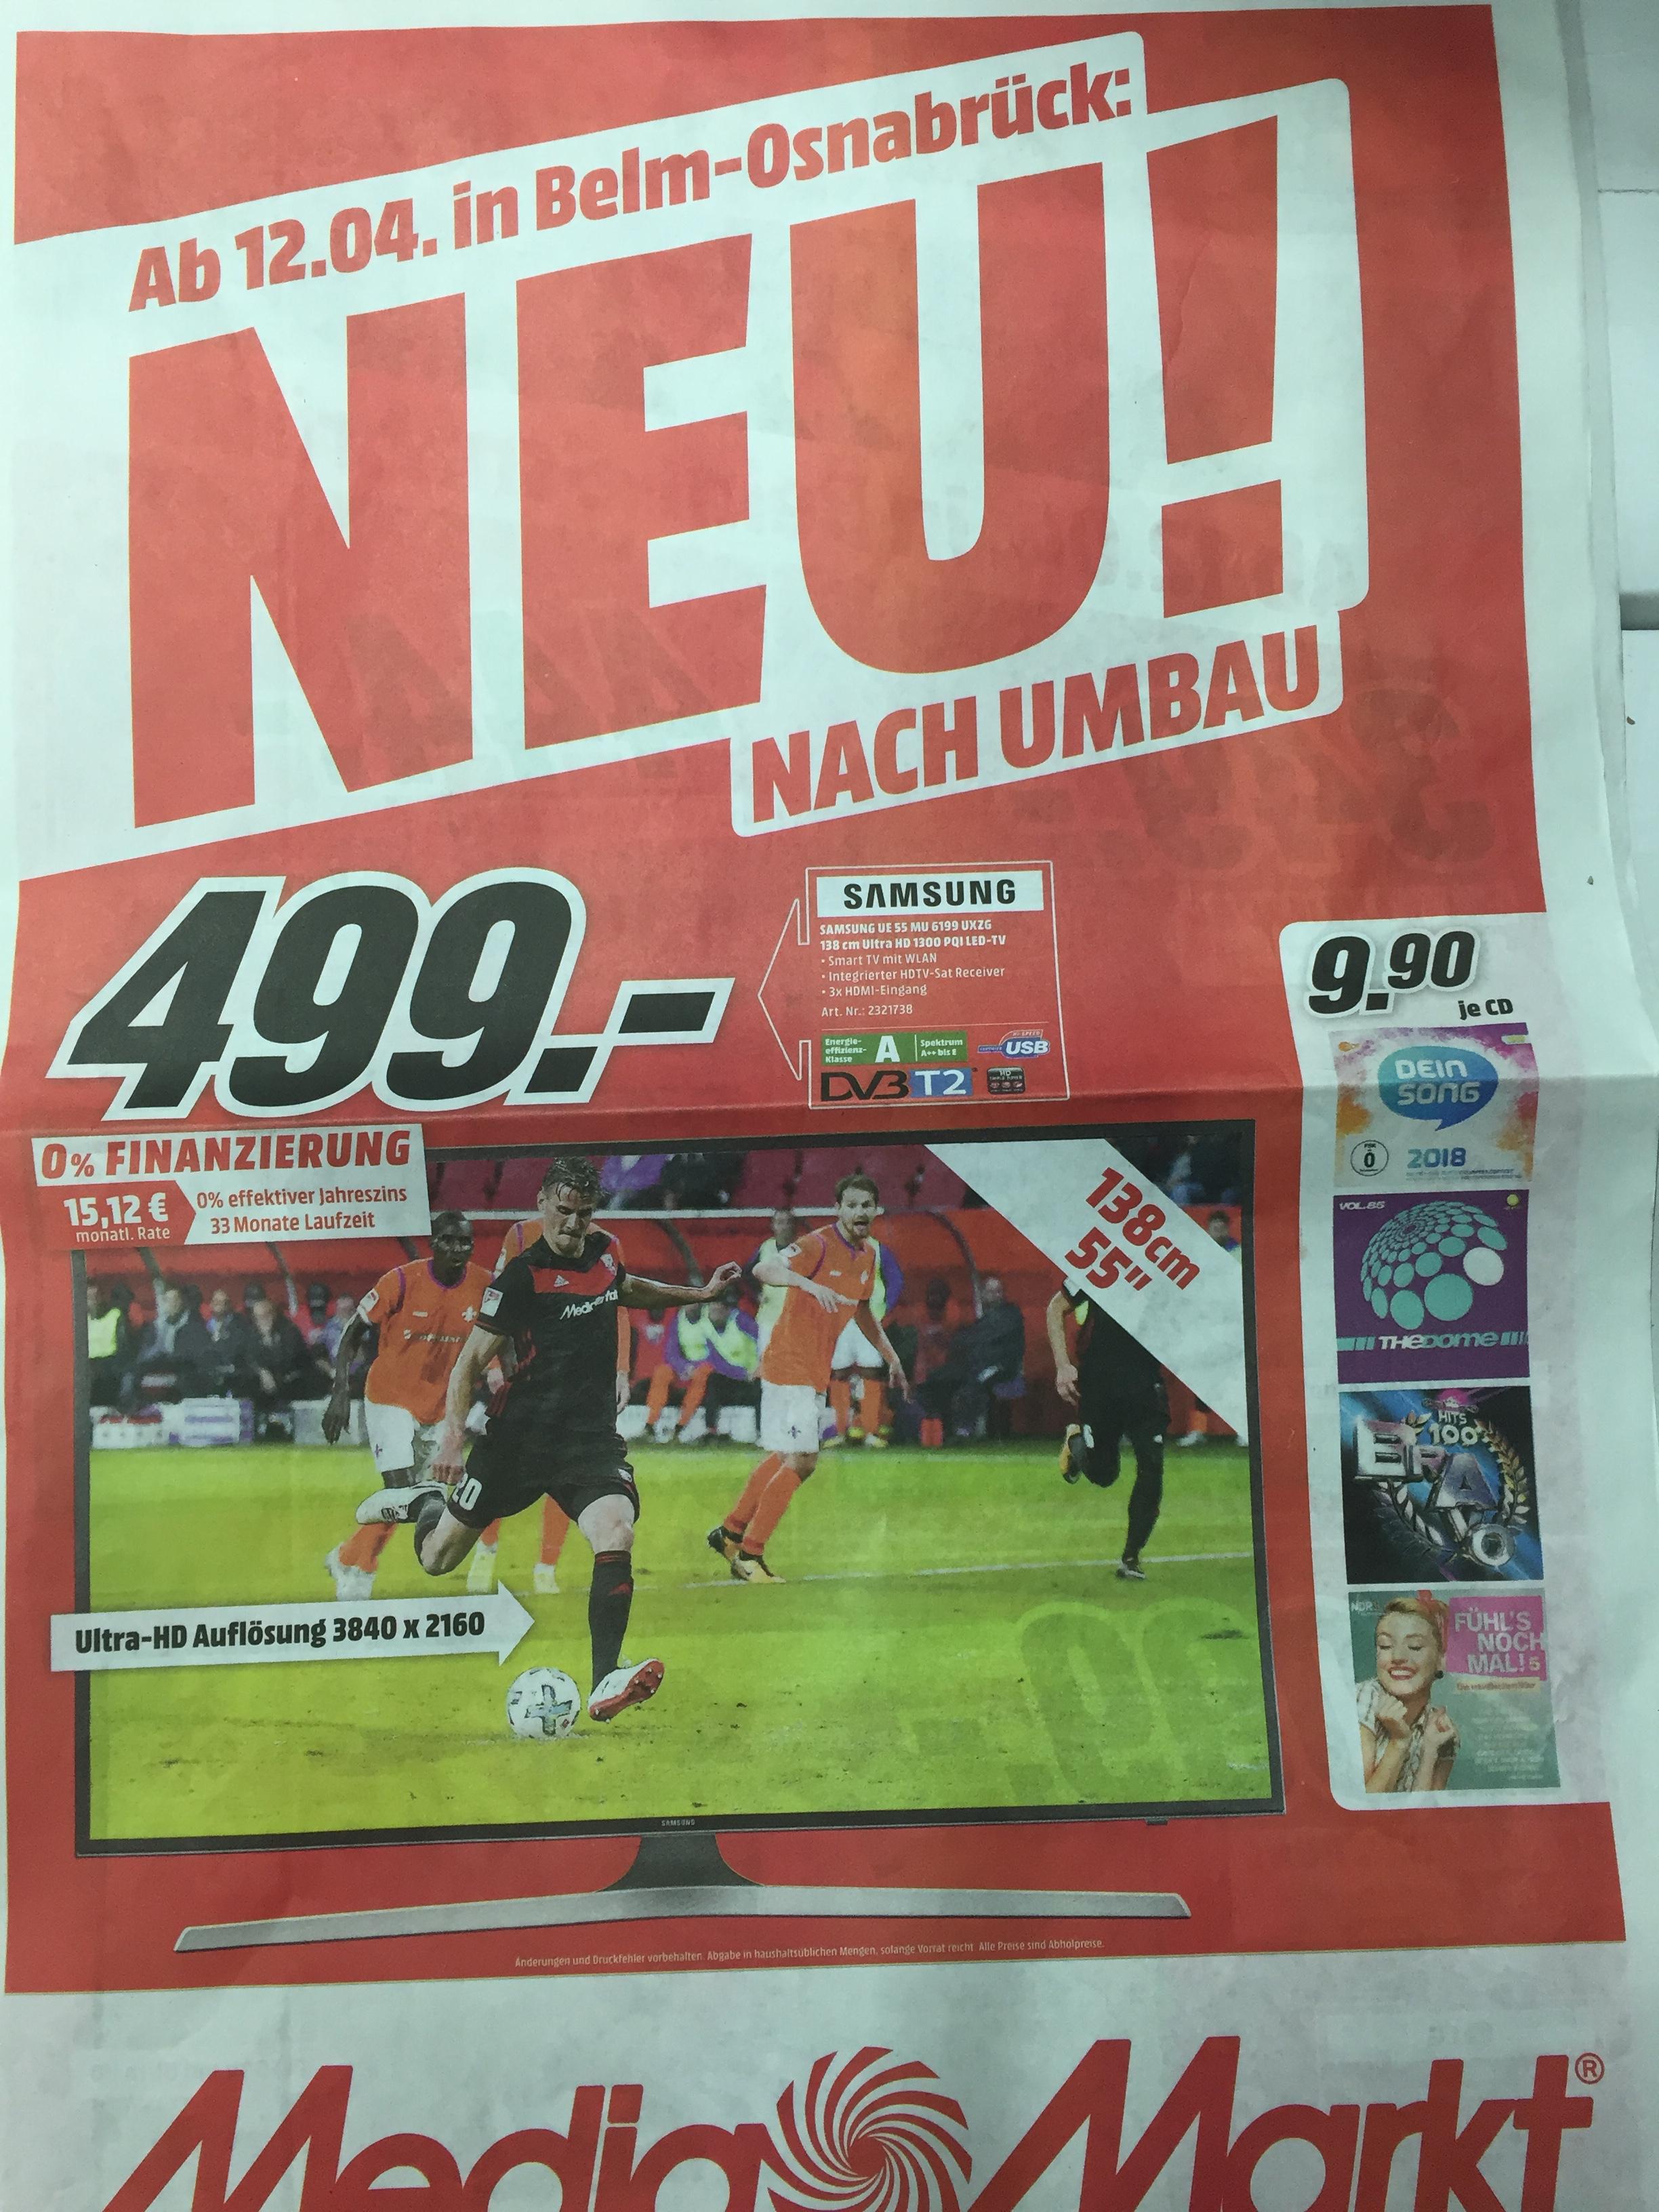 [Lokal Media Markt Osnabrück-Belm] Neueröffnungsangebote nach Umbau ab 12.04.18